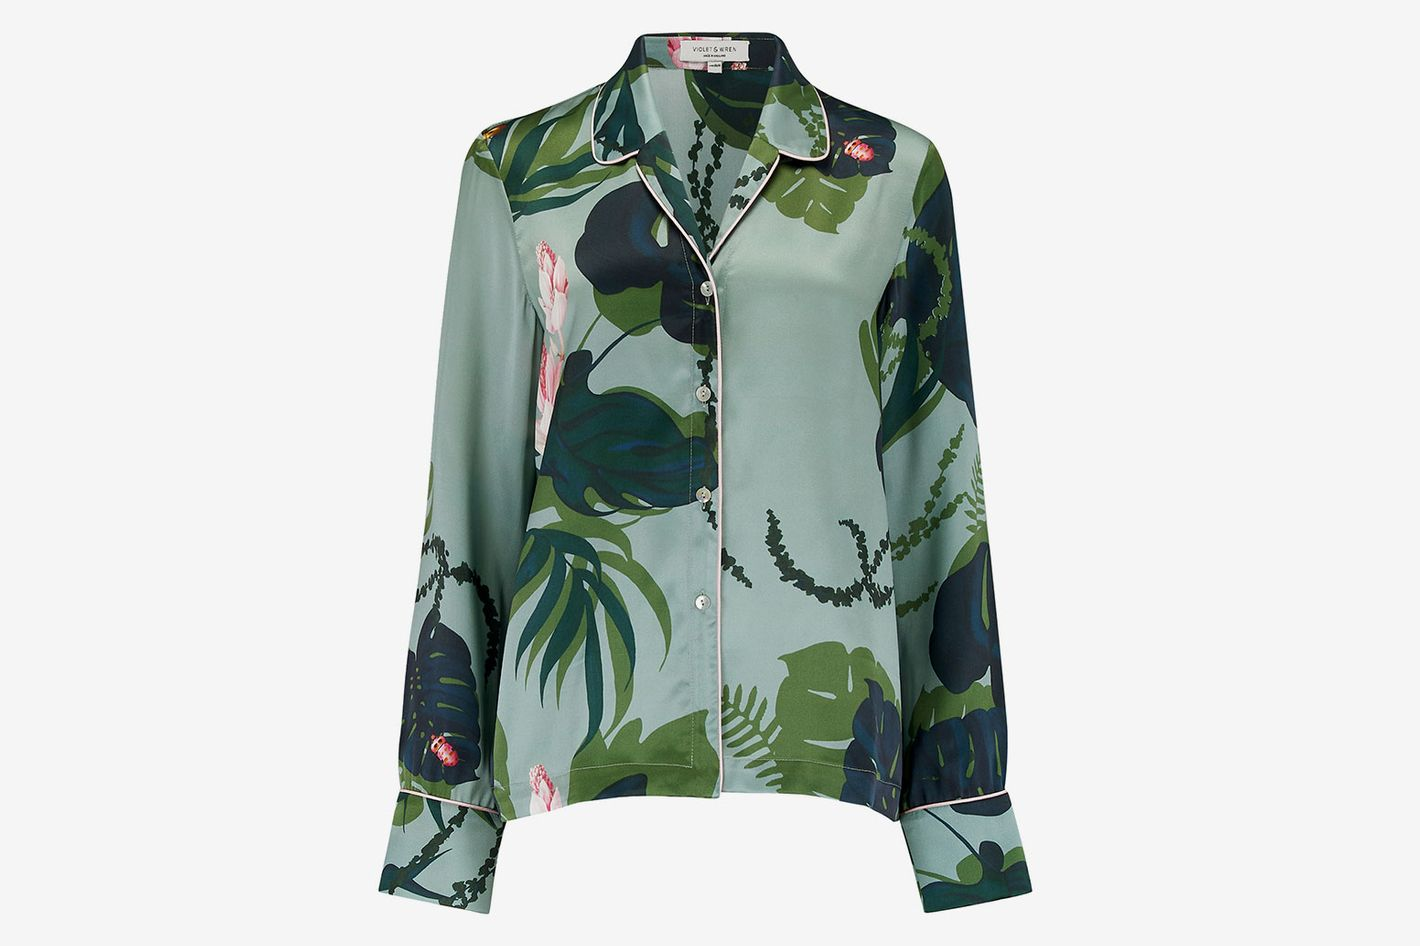 c3130a6252 26 Best Silk Pajamas for Women 2018